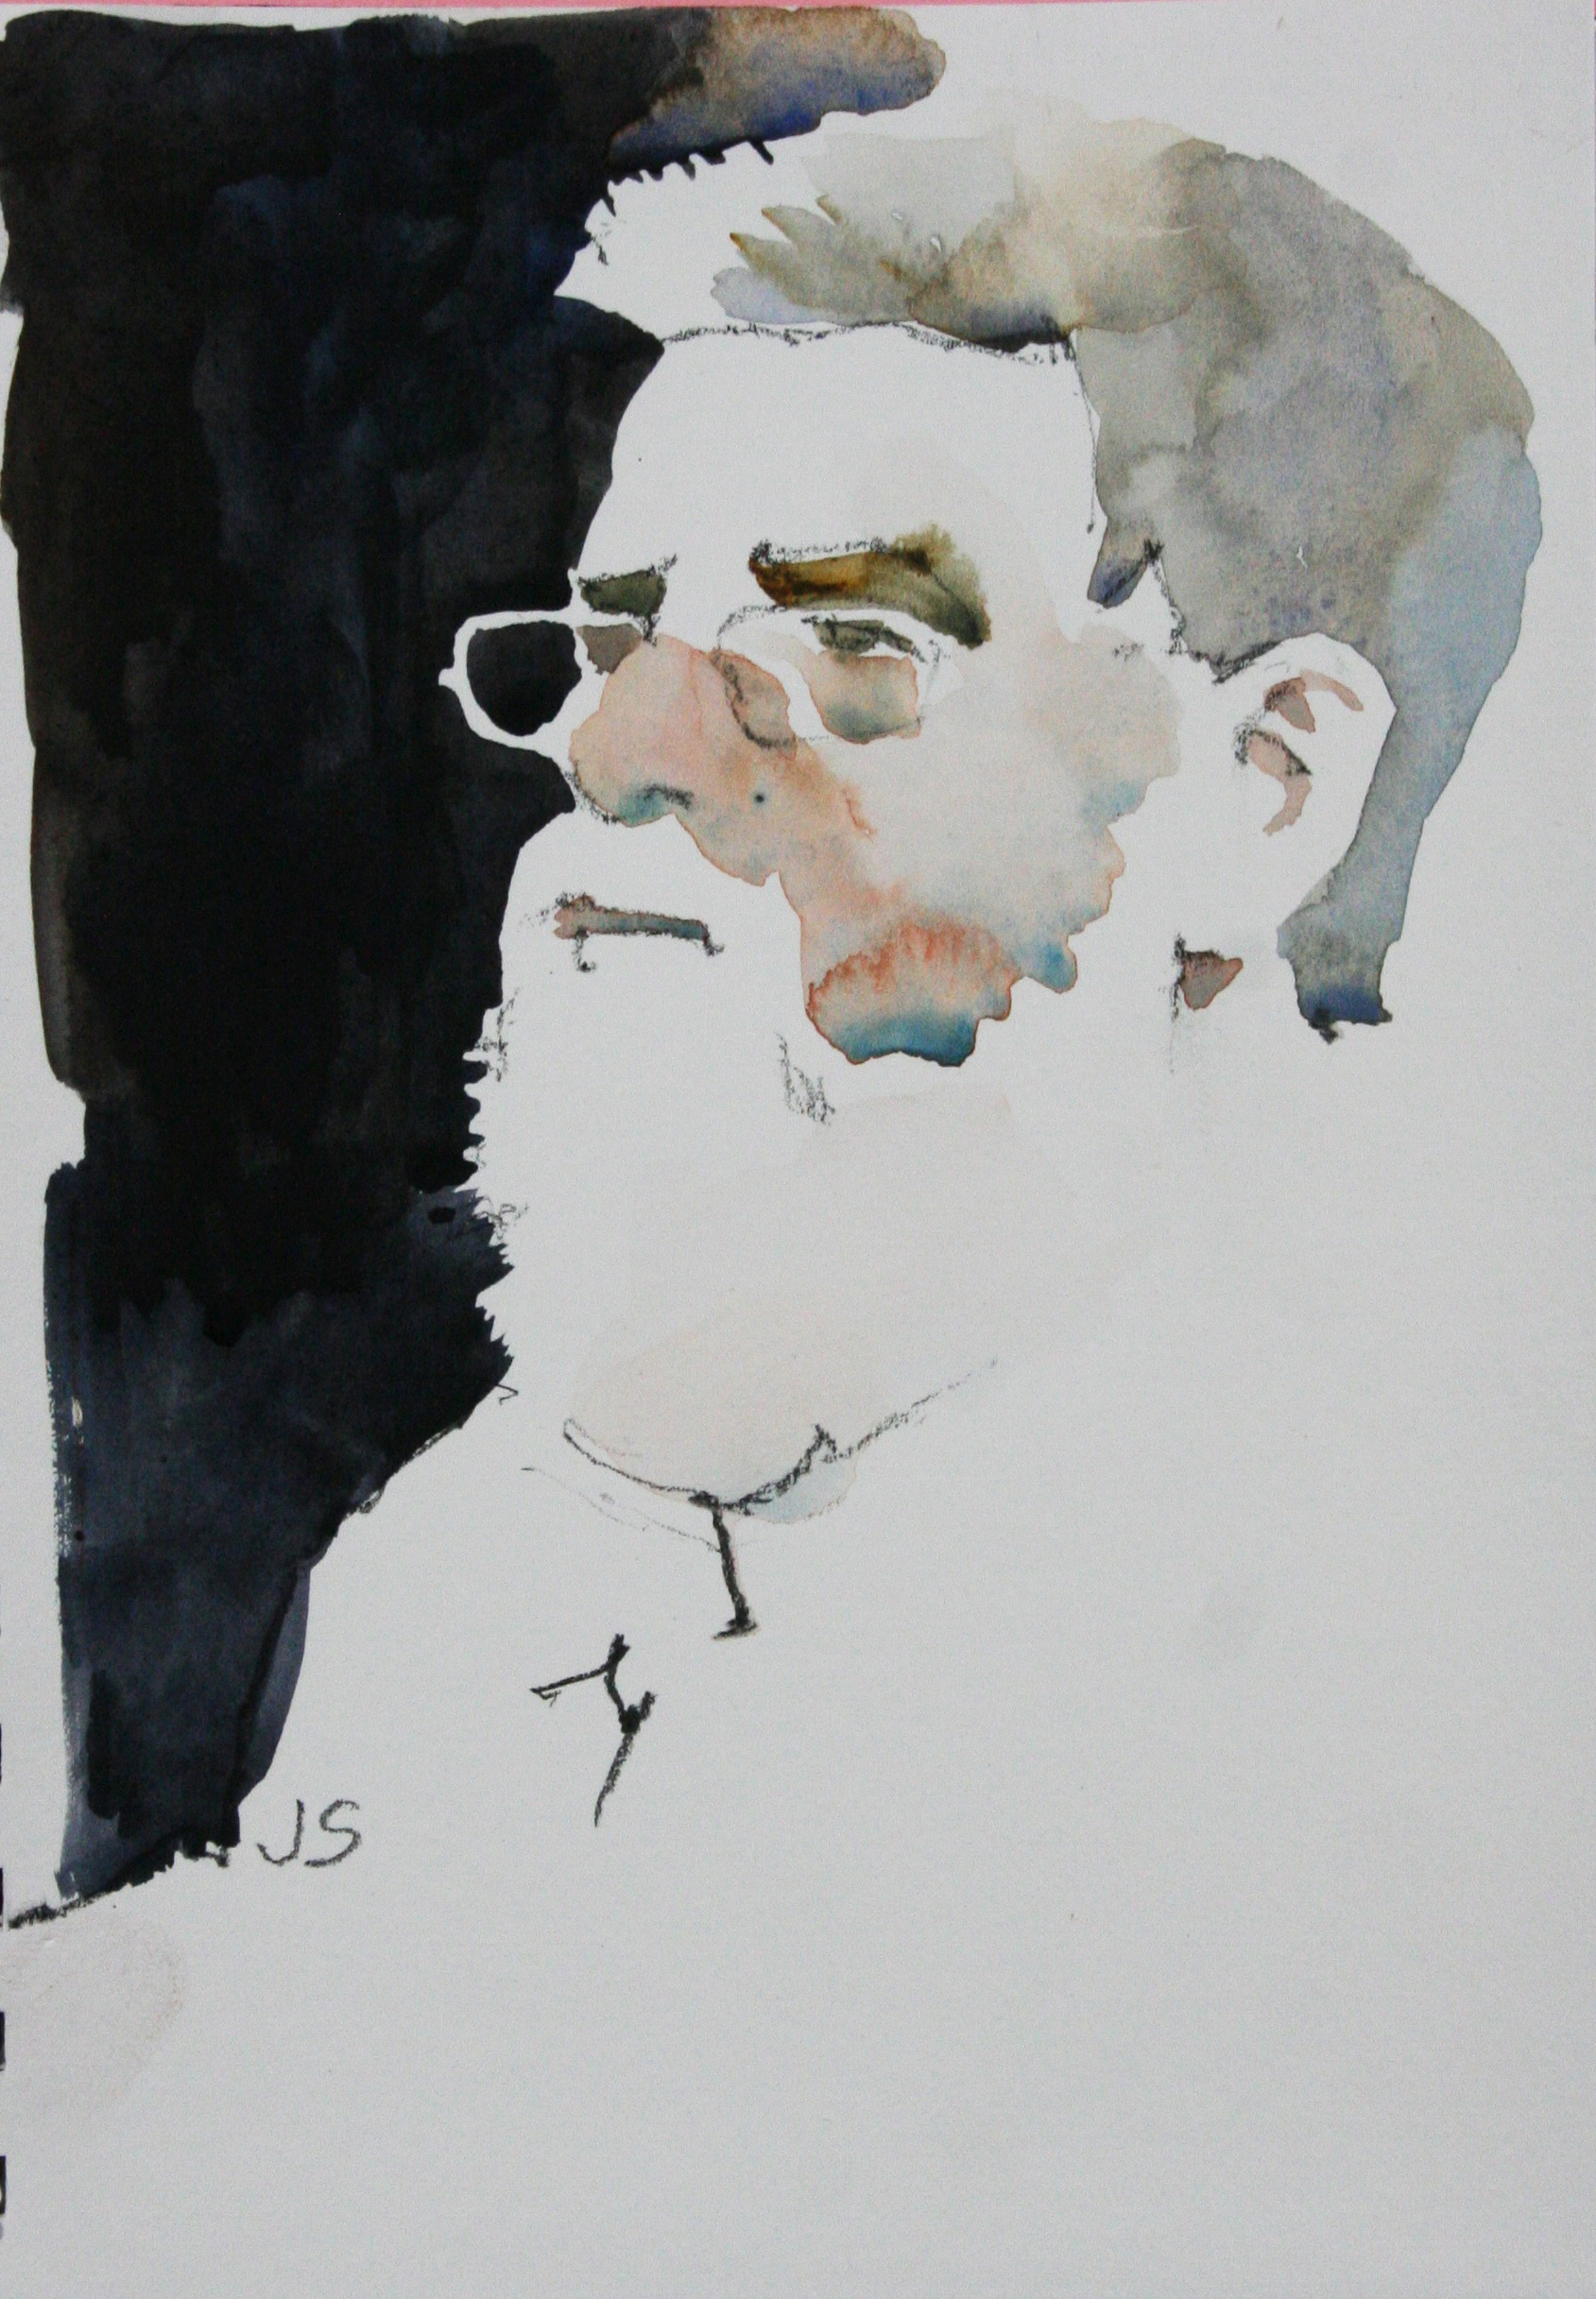 Jeff Suntala did this half hour watercolor.